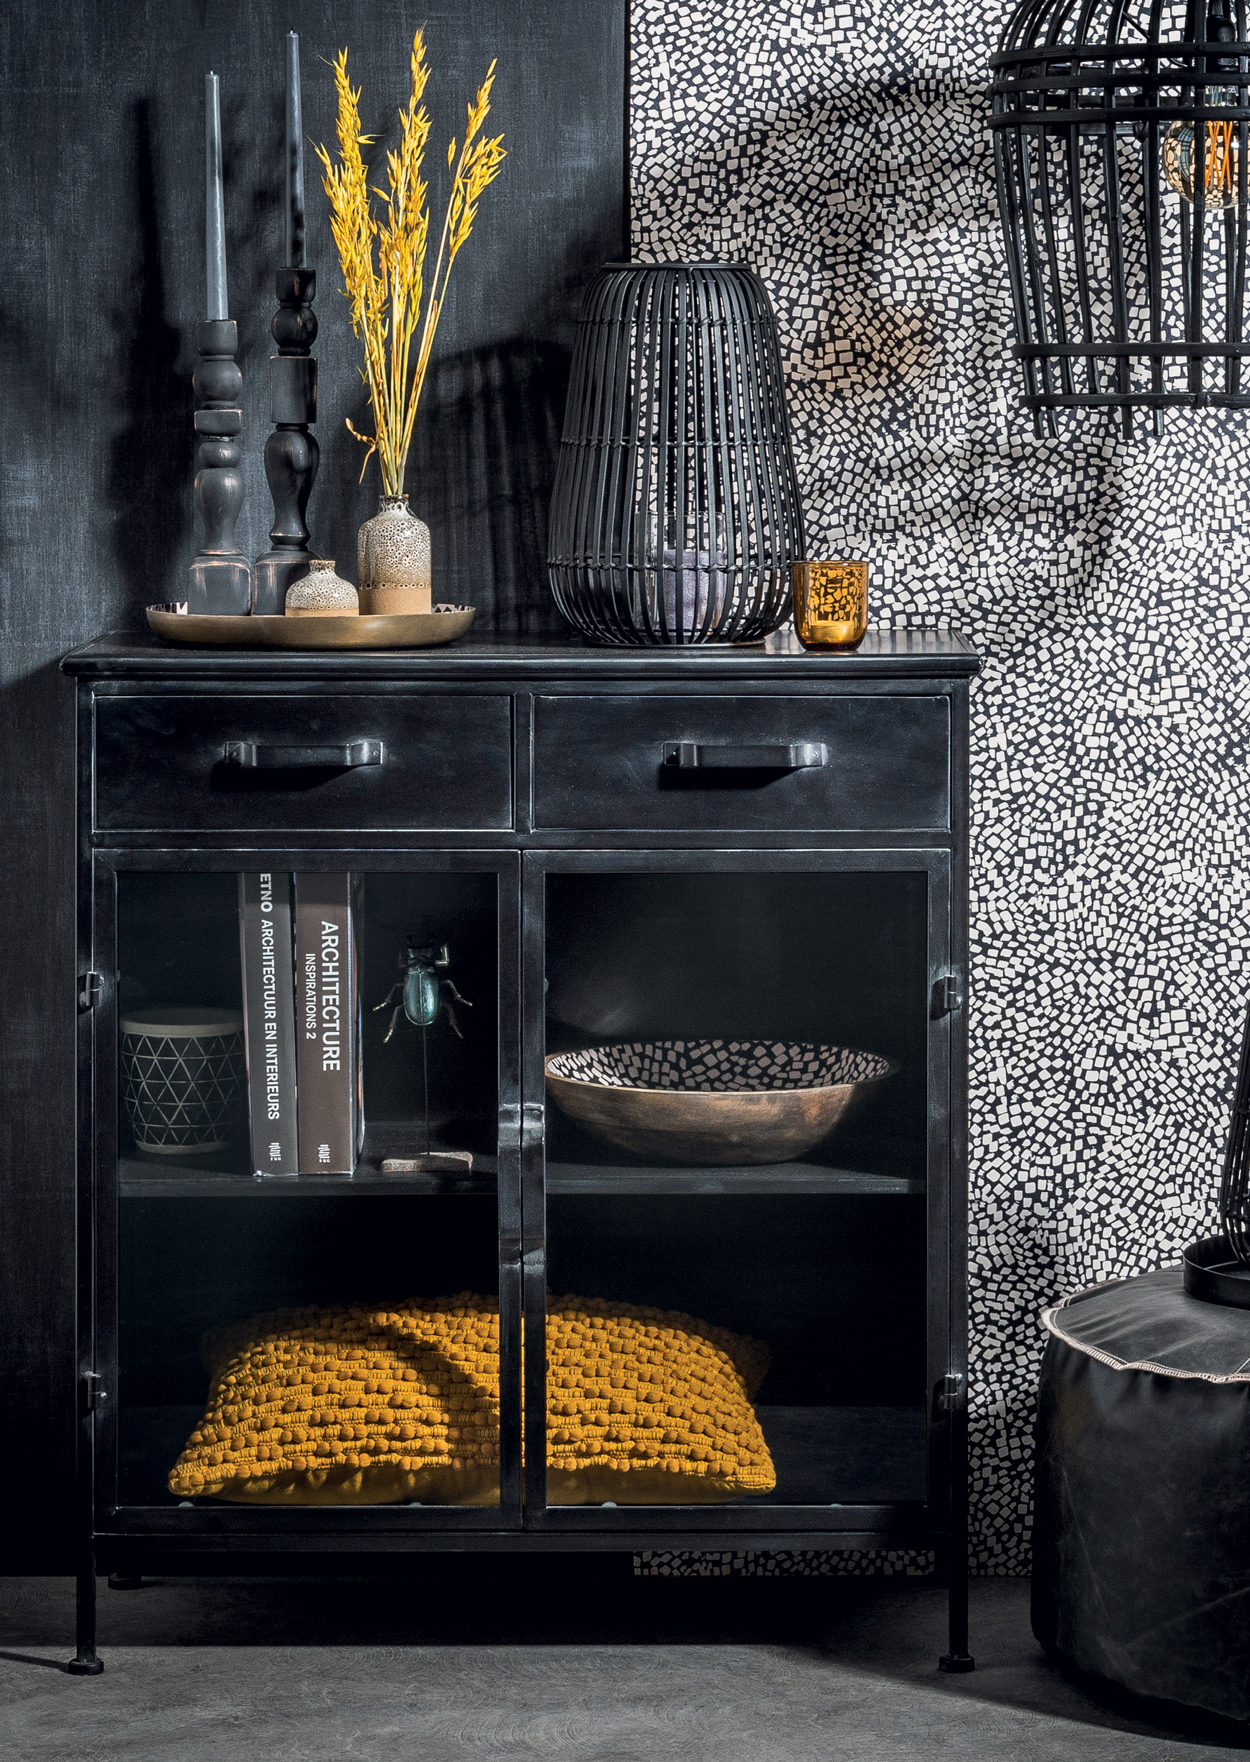 Zwarte wandkast met zwarte en okergele accessoires.